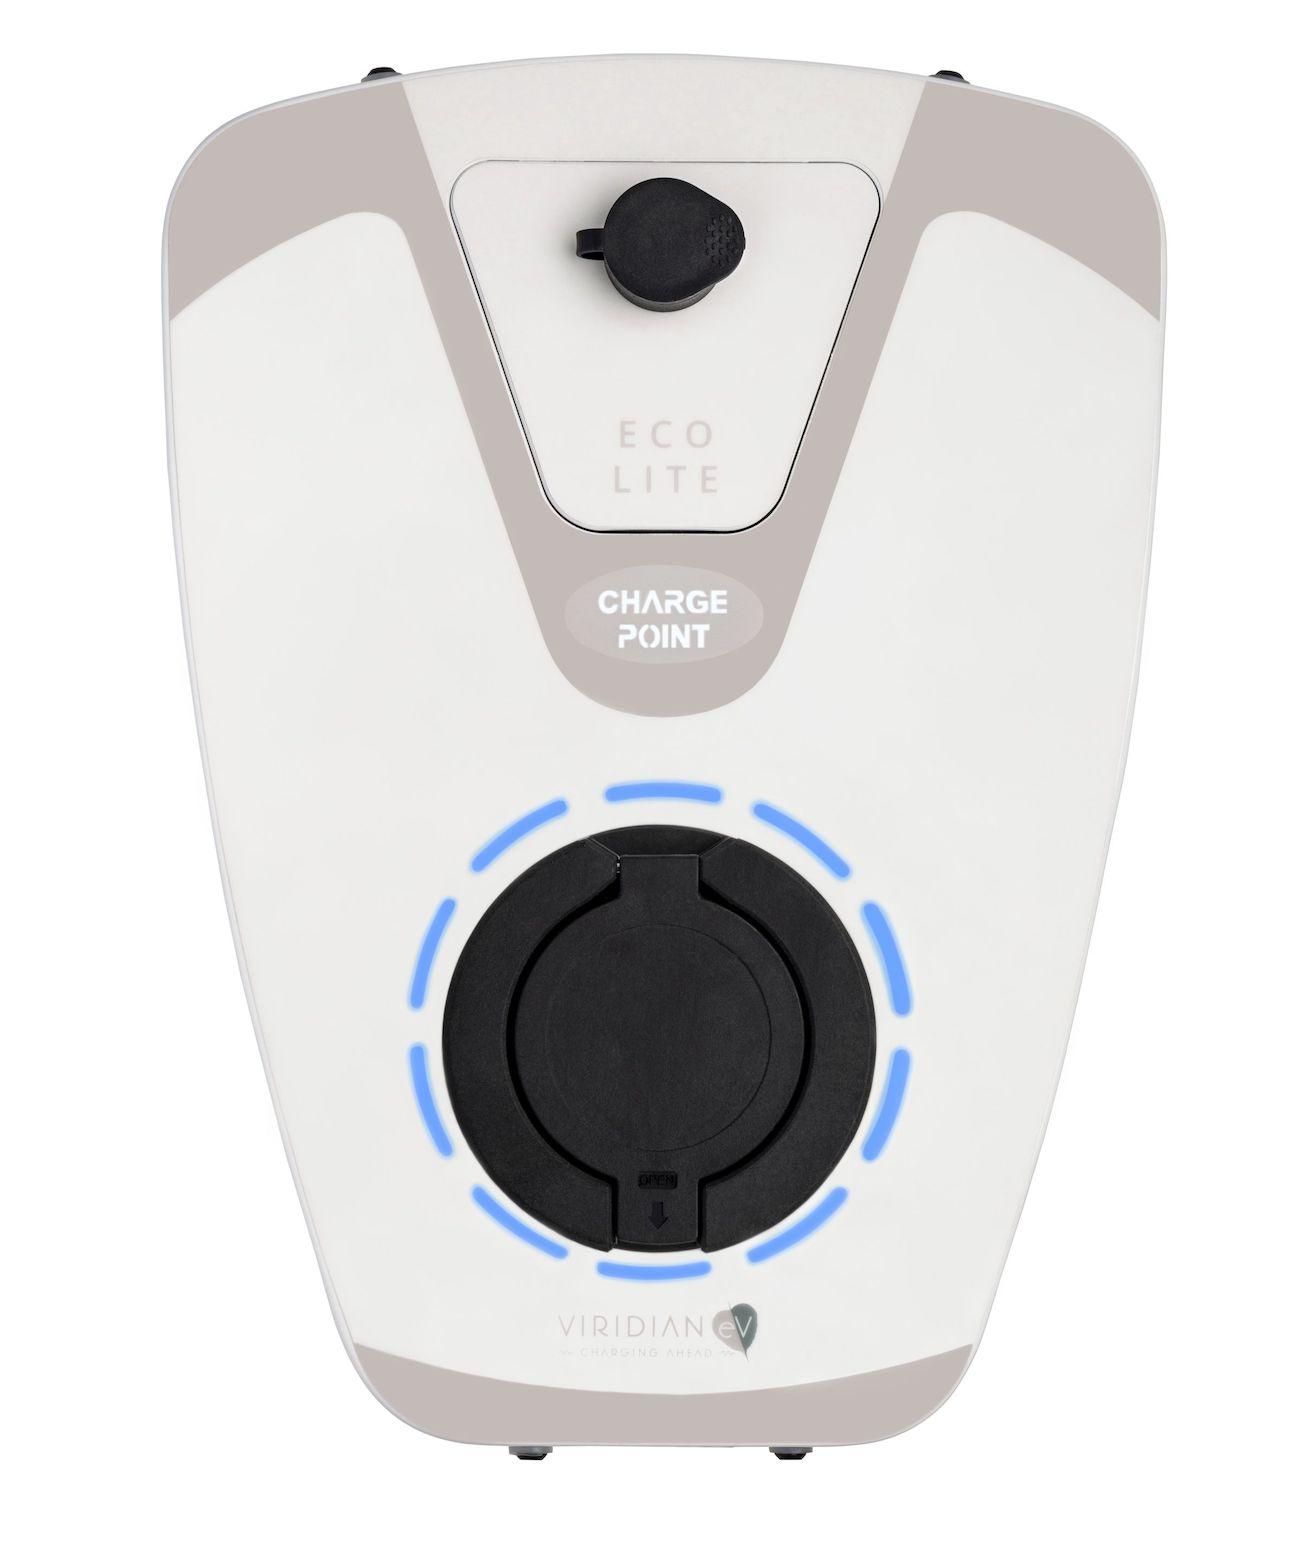 Ecolite Charge-point-LED-blue-ret-even_web